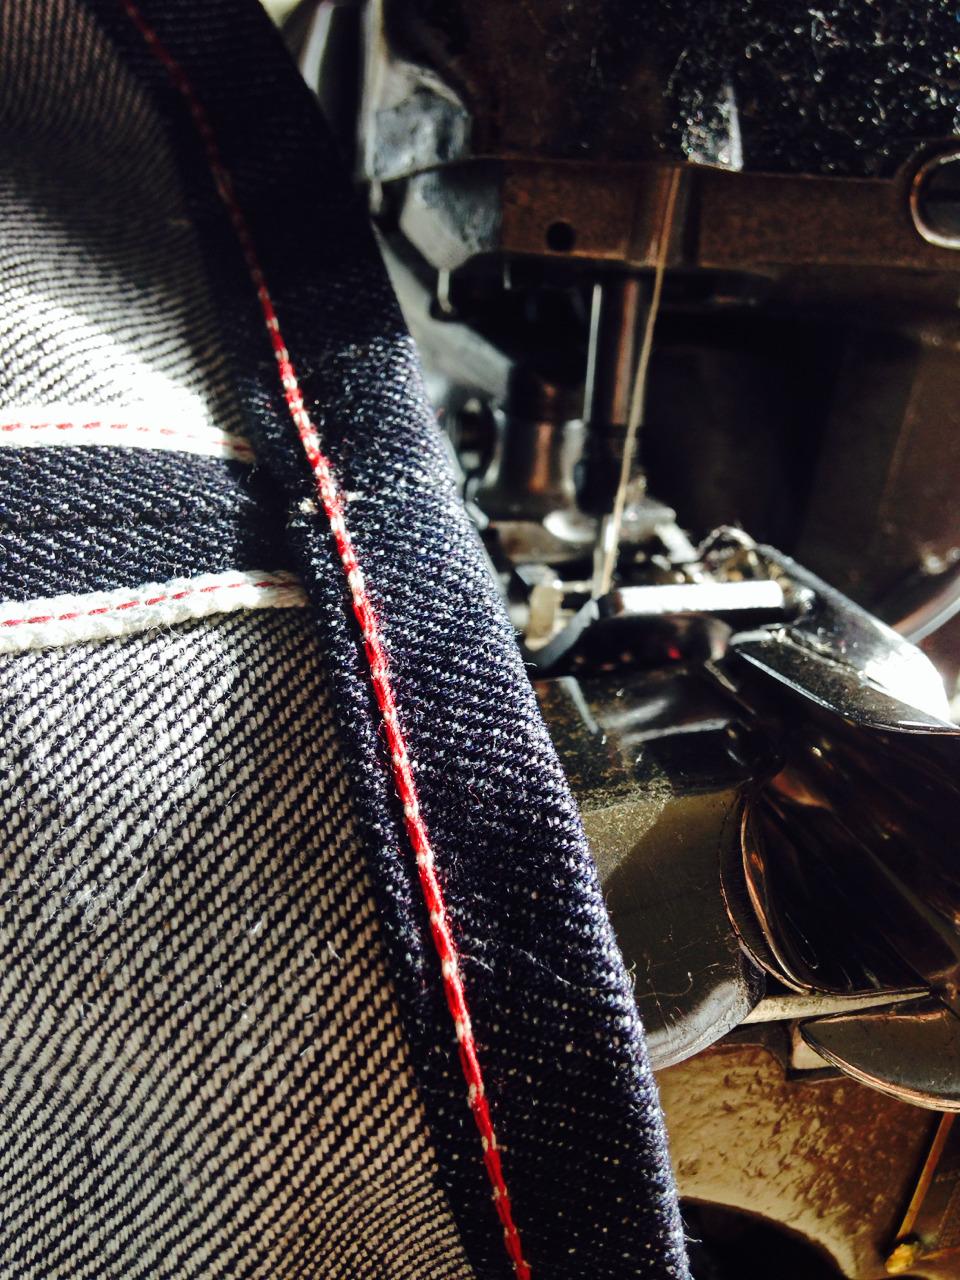 dawsondenim :     Dawson denim jeans hemmed on our 1959 union special 43200g